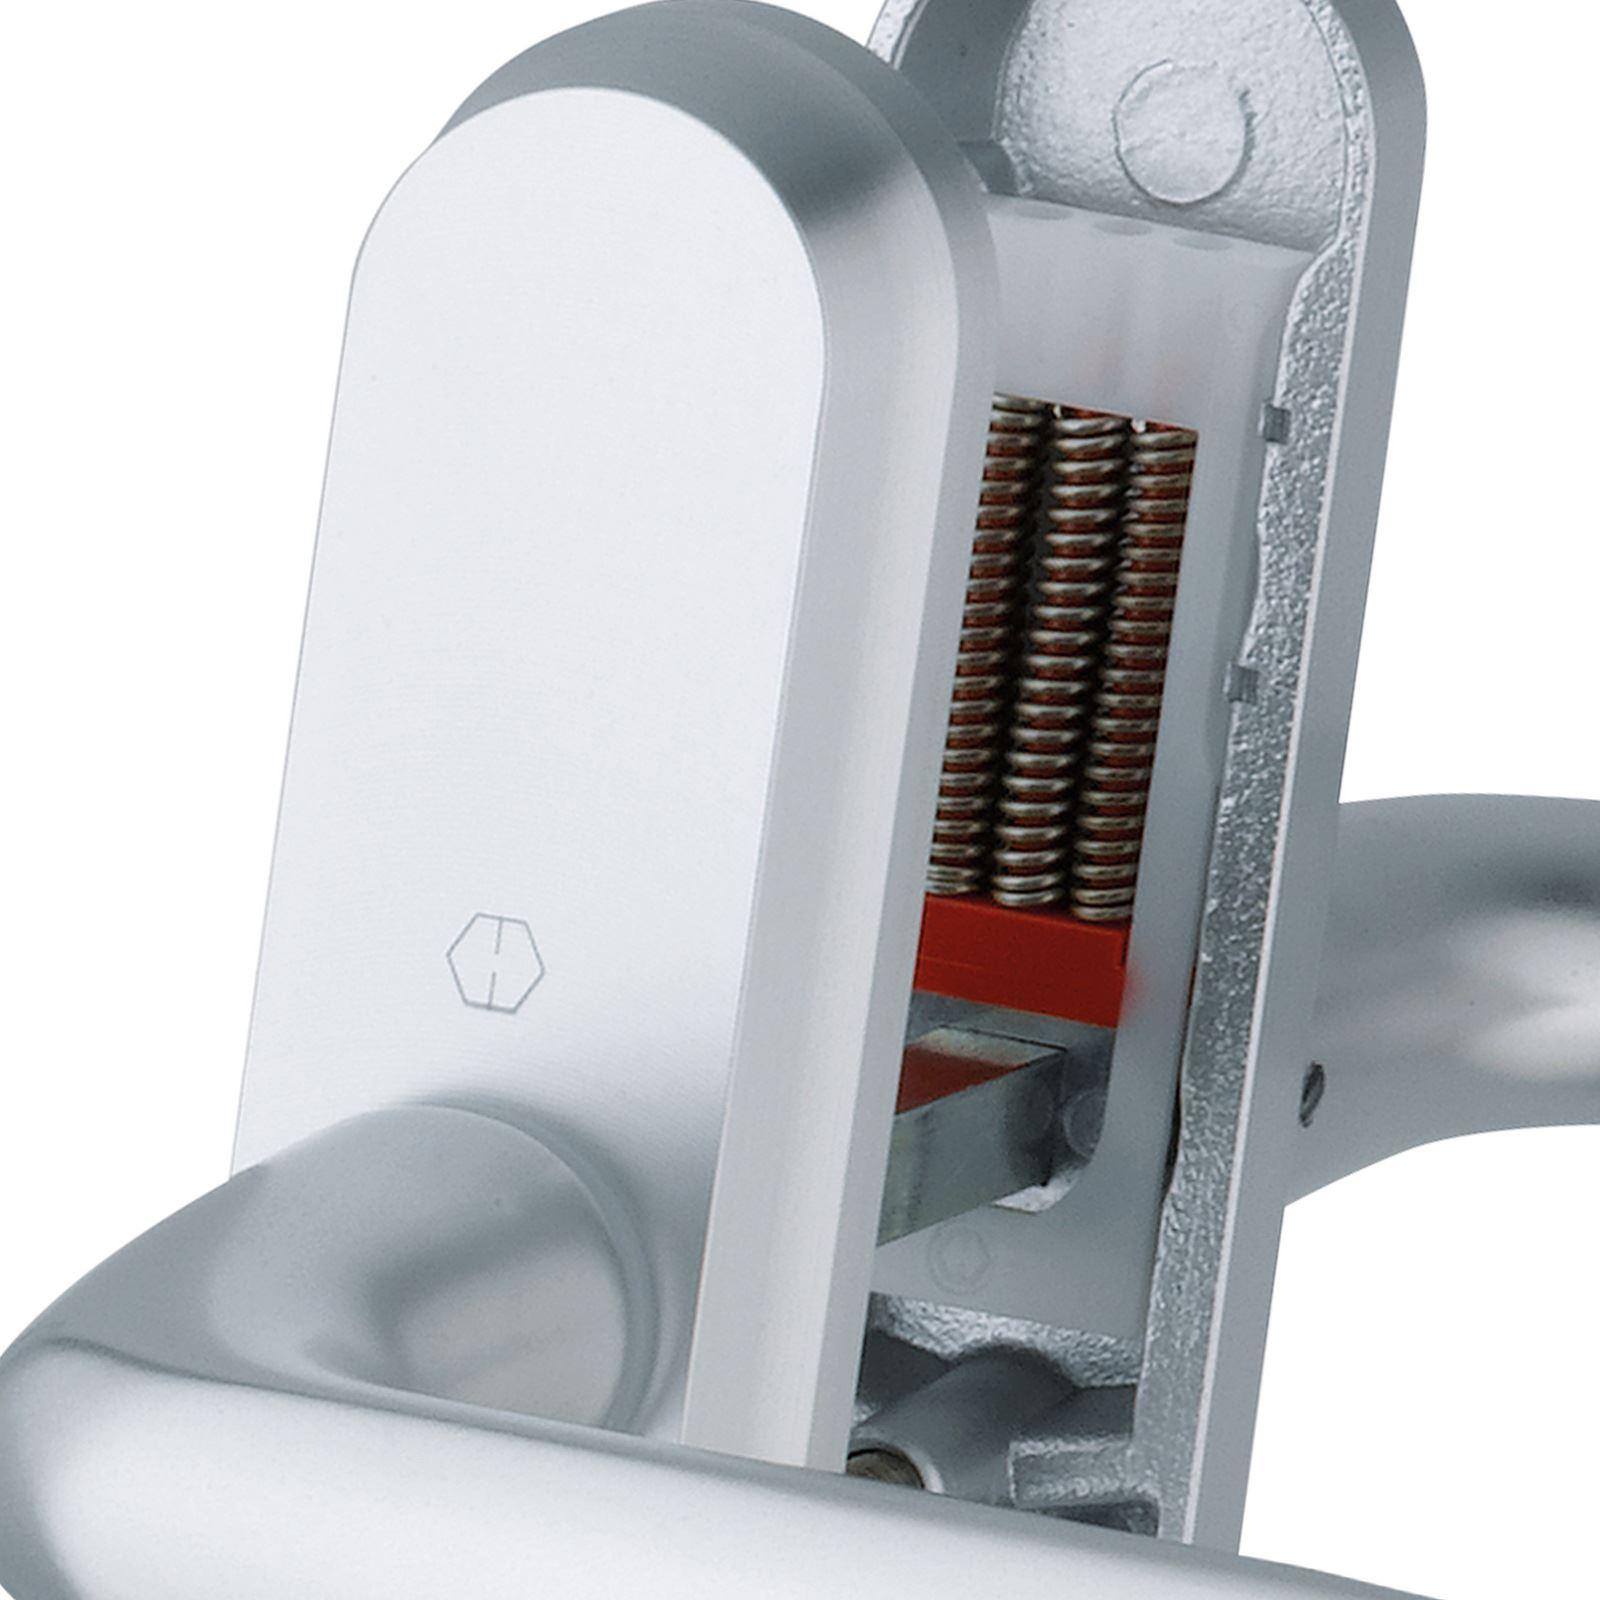 Hoppe Atlanta Pair Handle Pas 24 92pz 92mm High Security